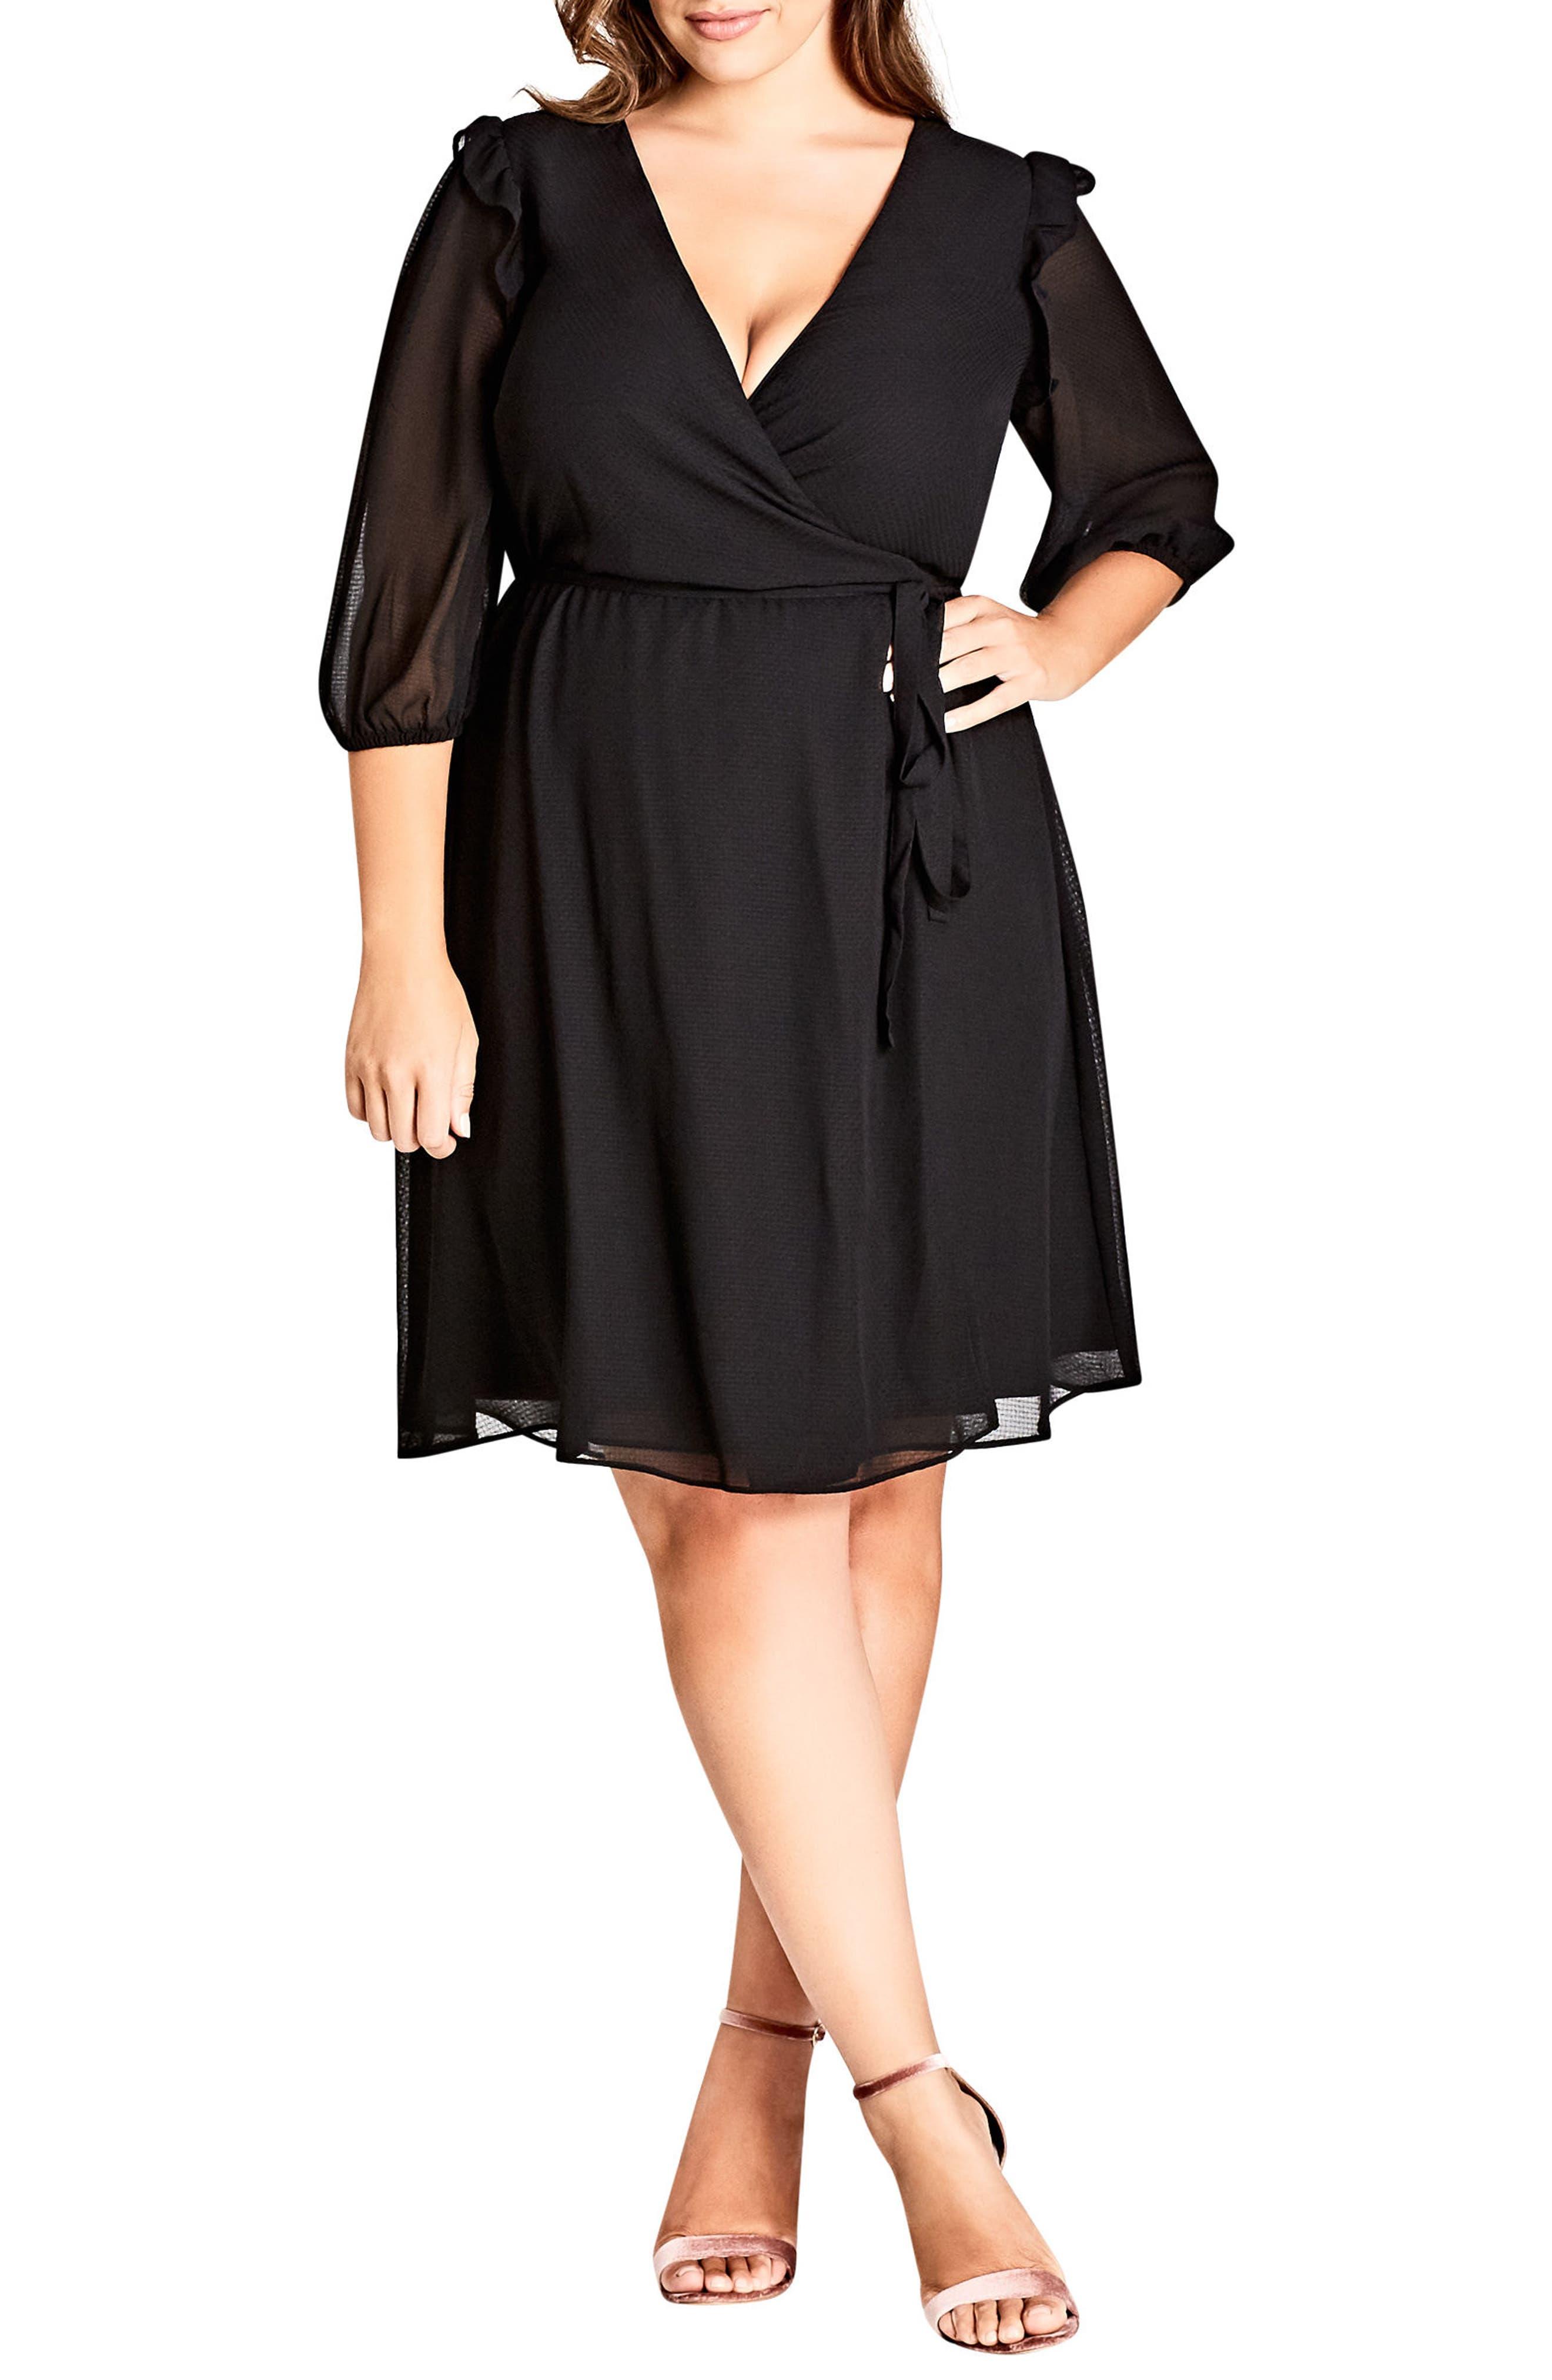 Simply So Wrap Dress,                         Main,                         color, 001